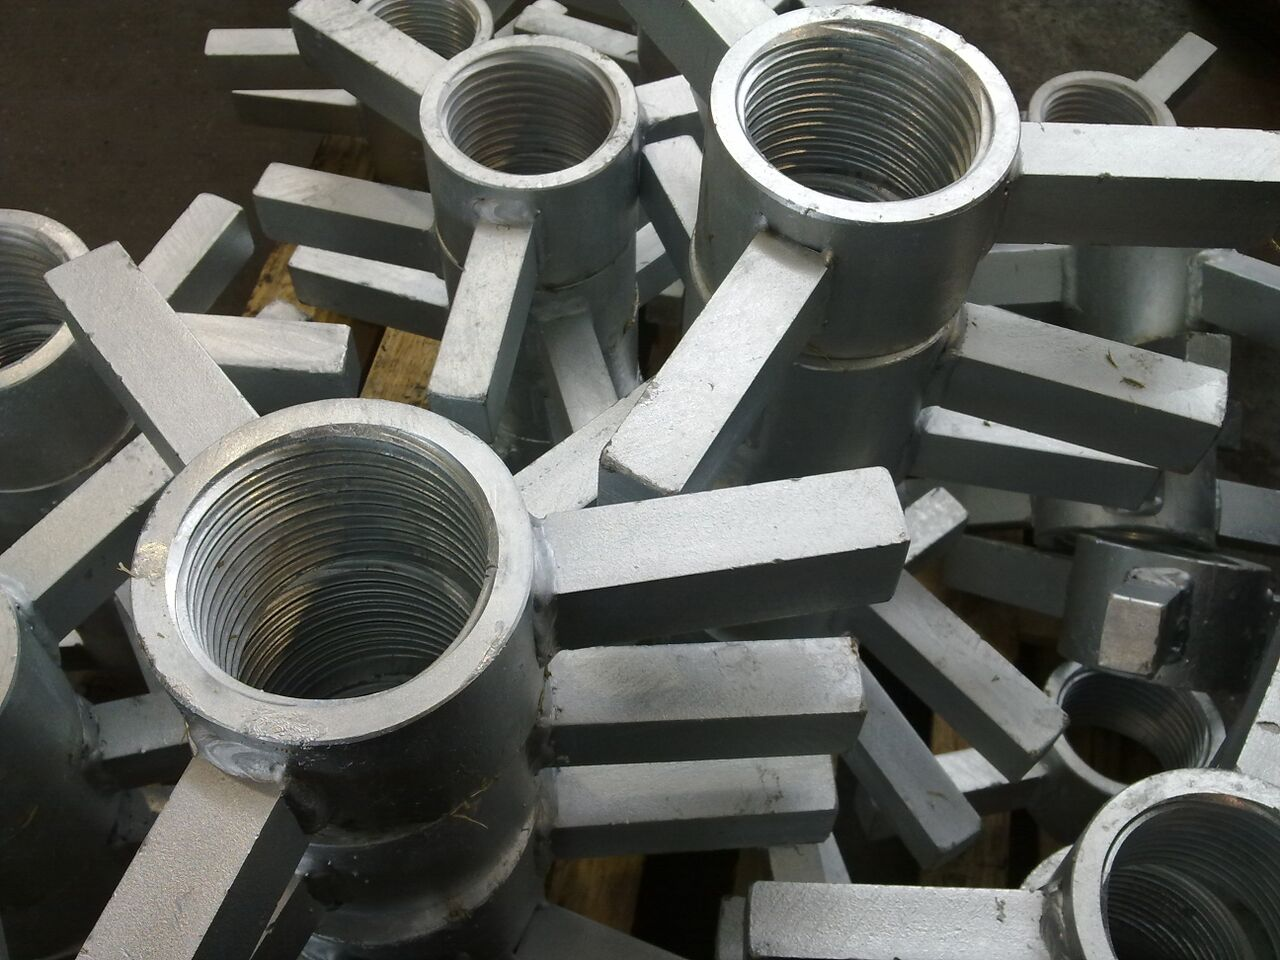 Particolari-zincati-a-caldo-Zardini-Srl-150x150.jpg